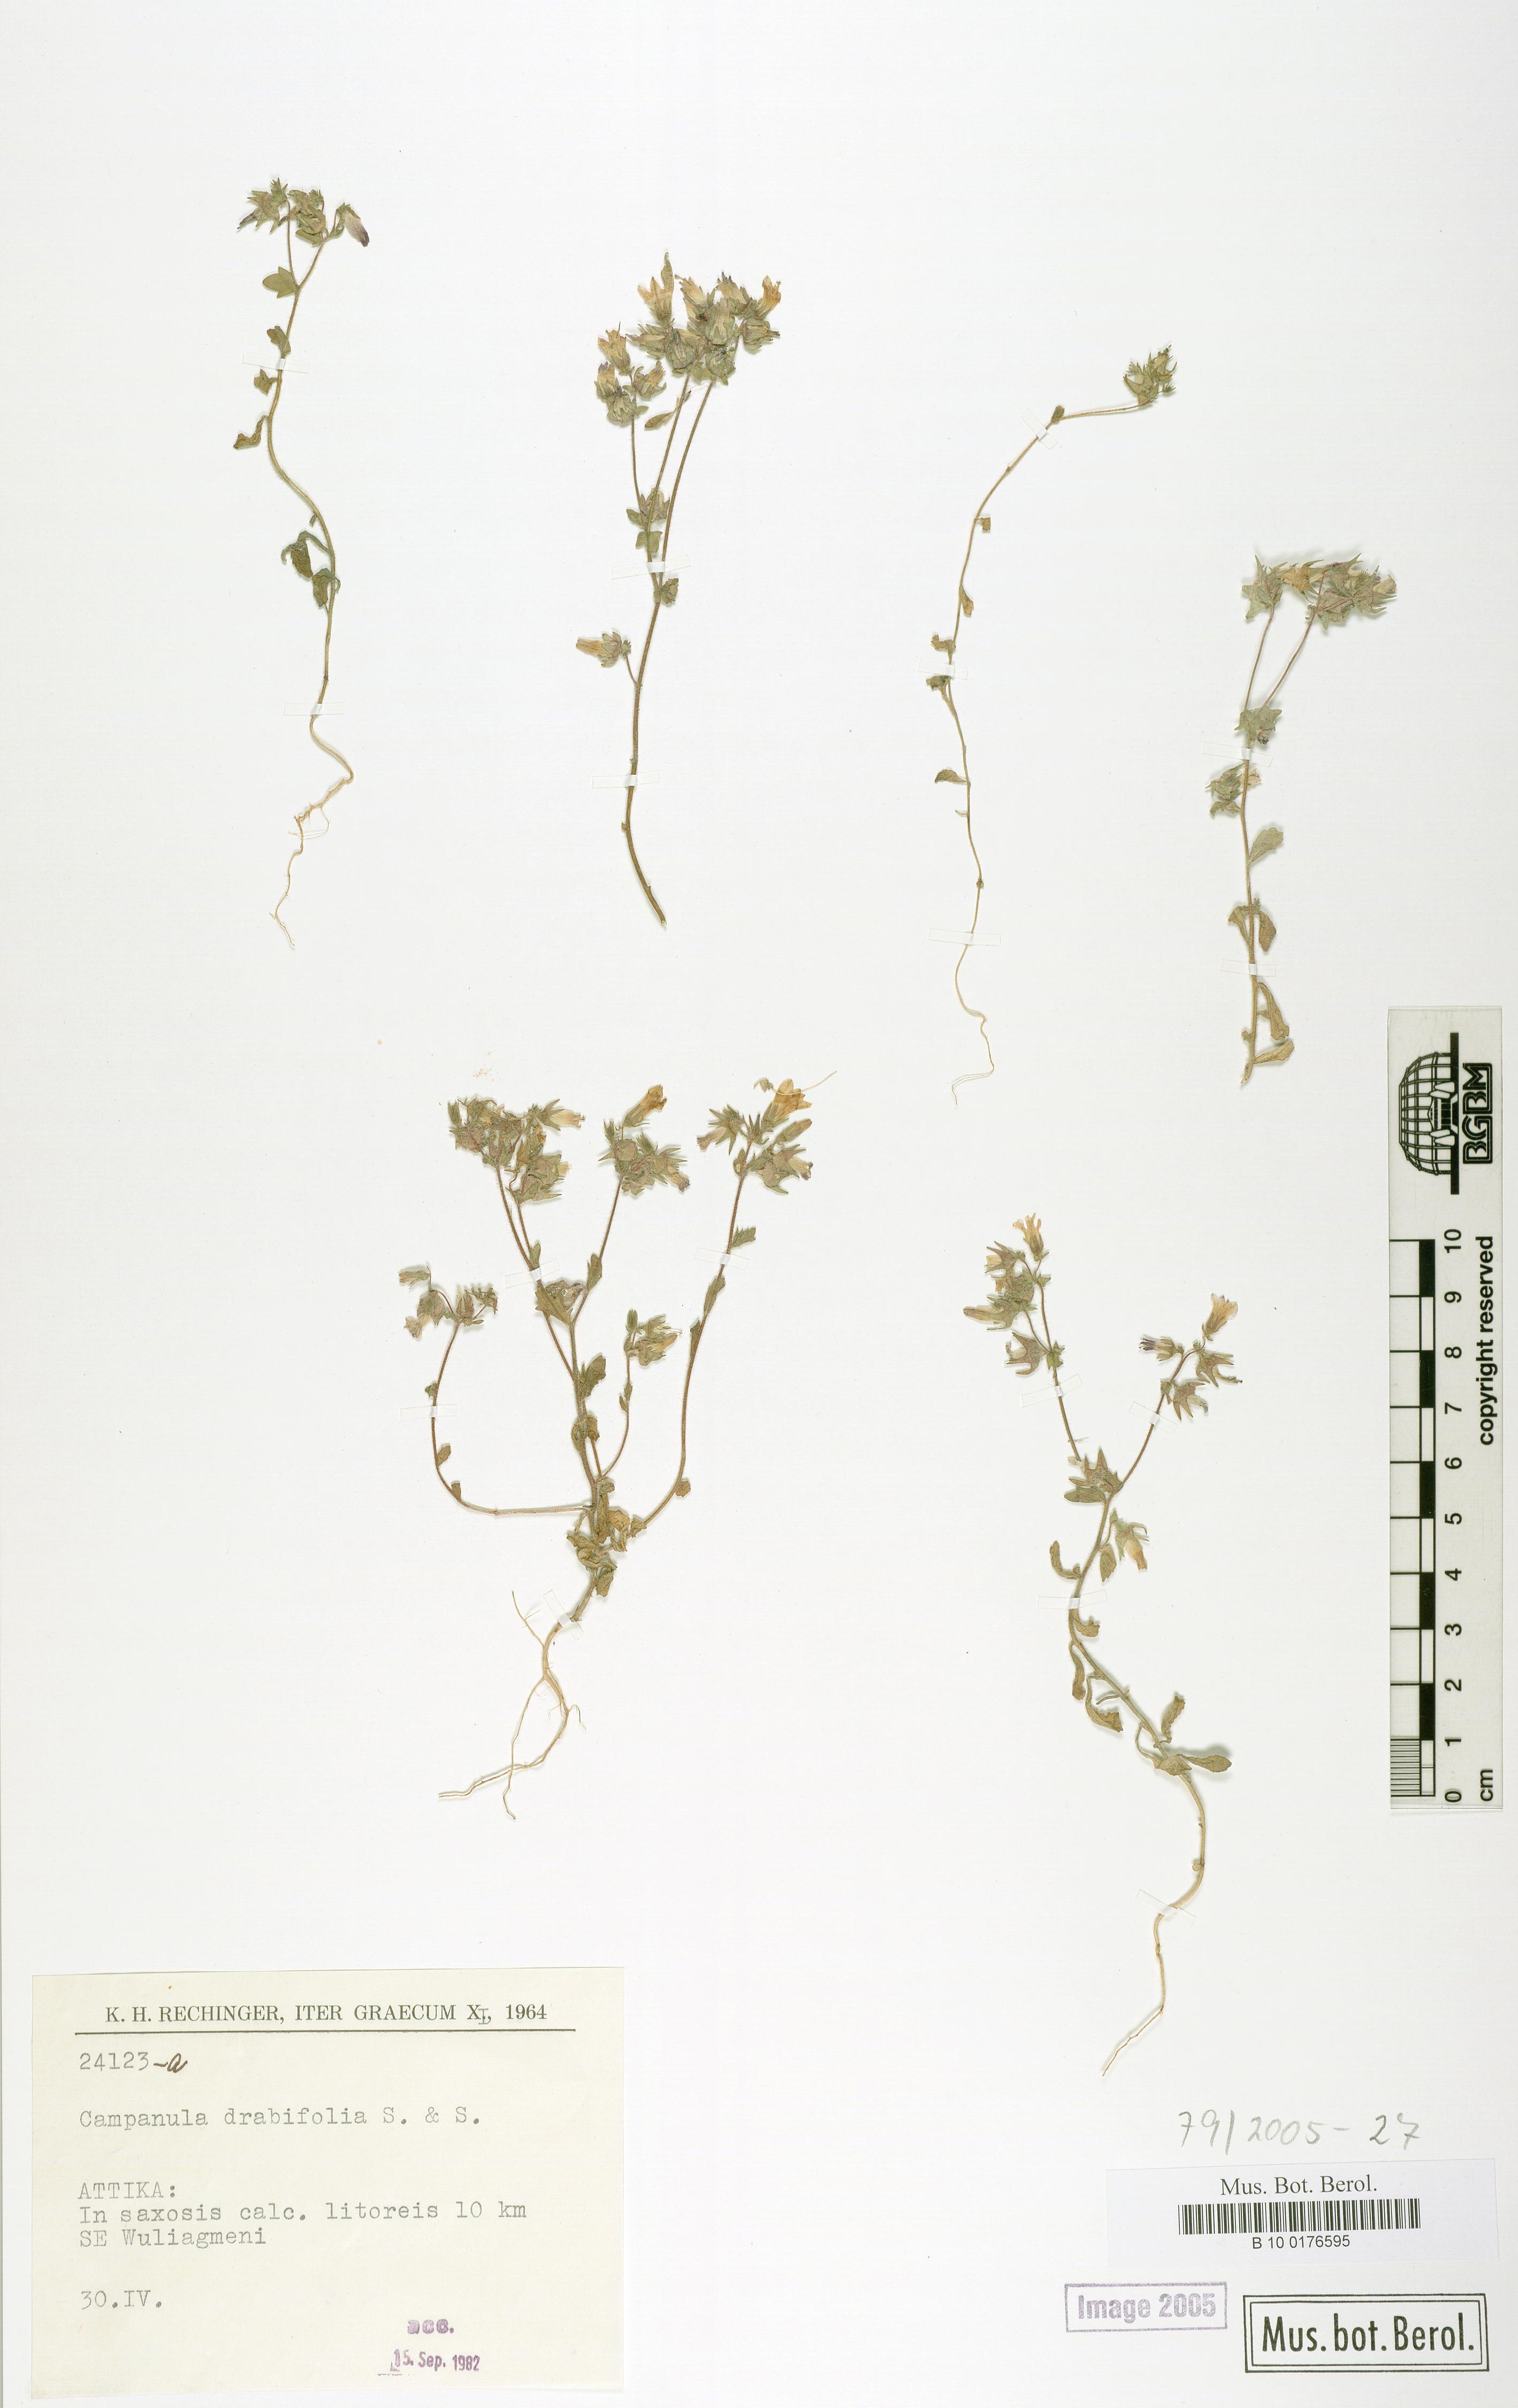 http://ww2.bgbm.org/herbarium/images/B/10/01/76/59/B_10_0176595.jpg